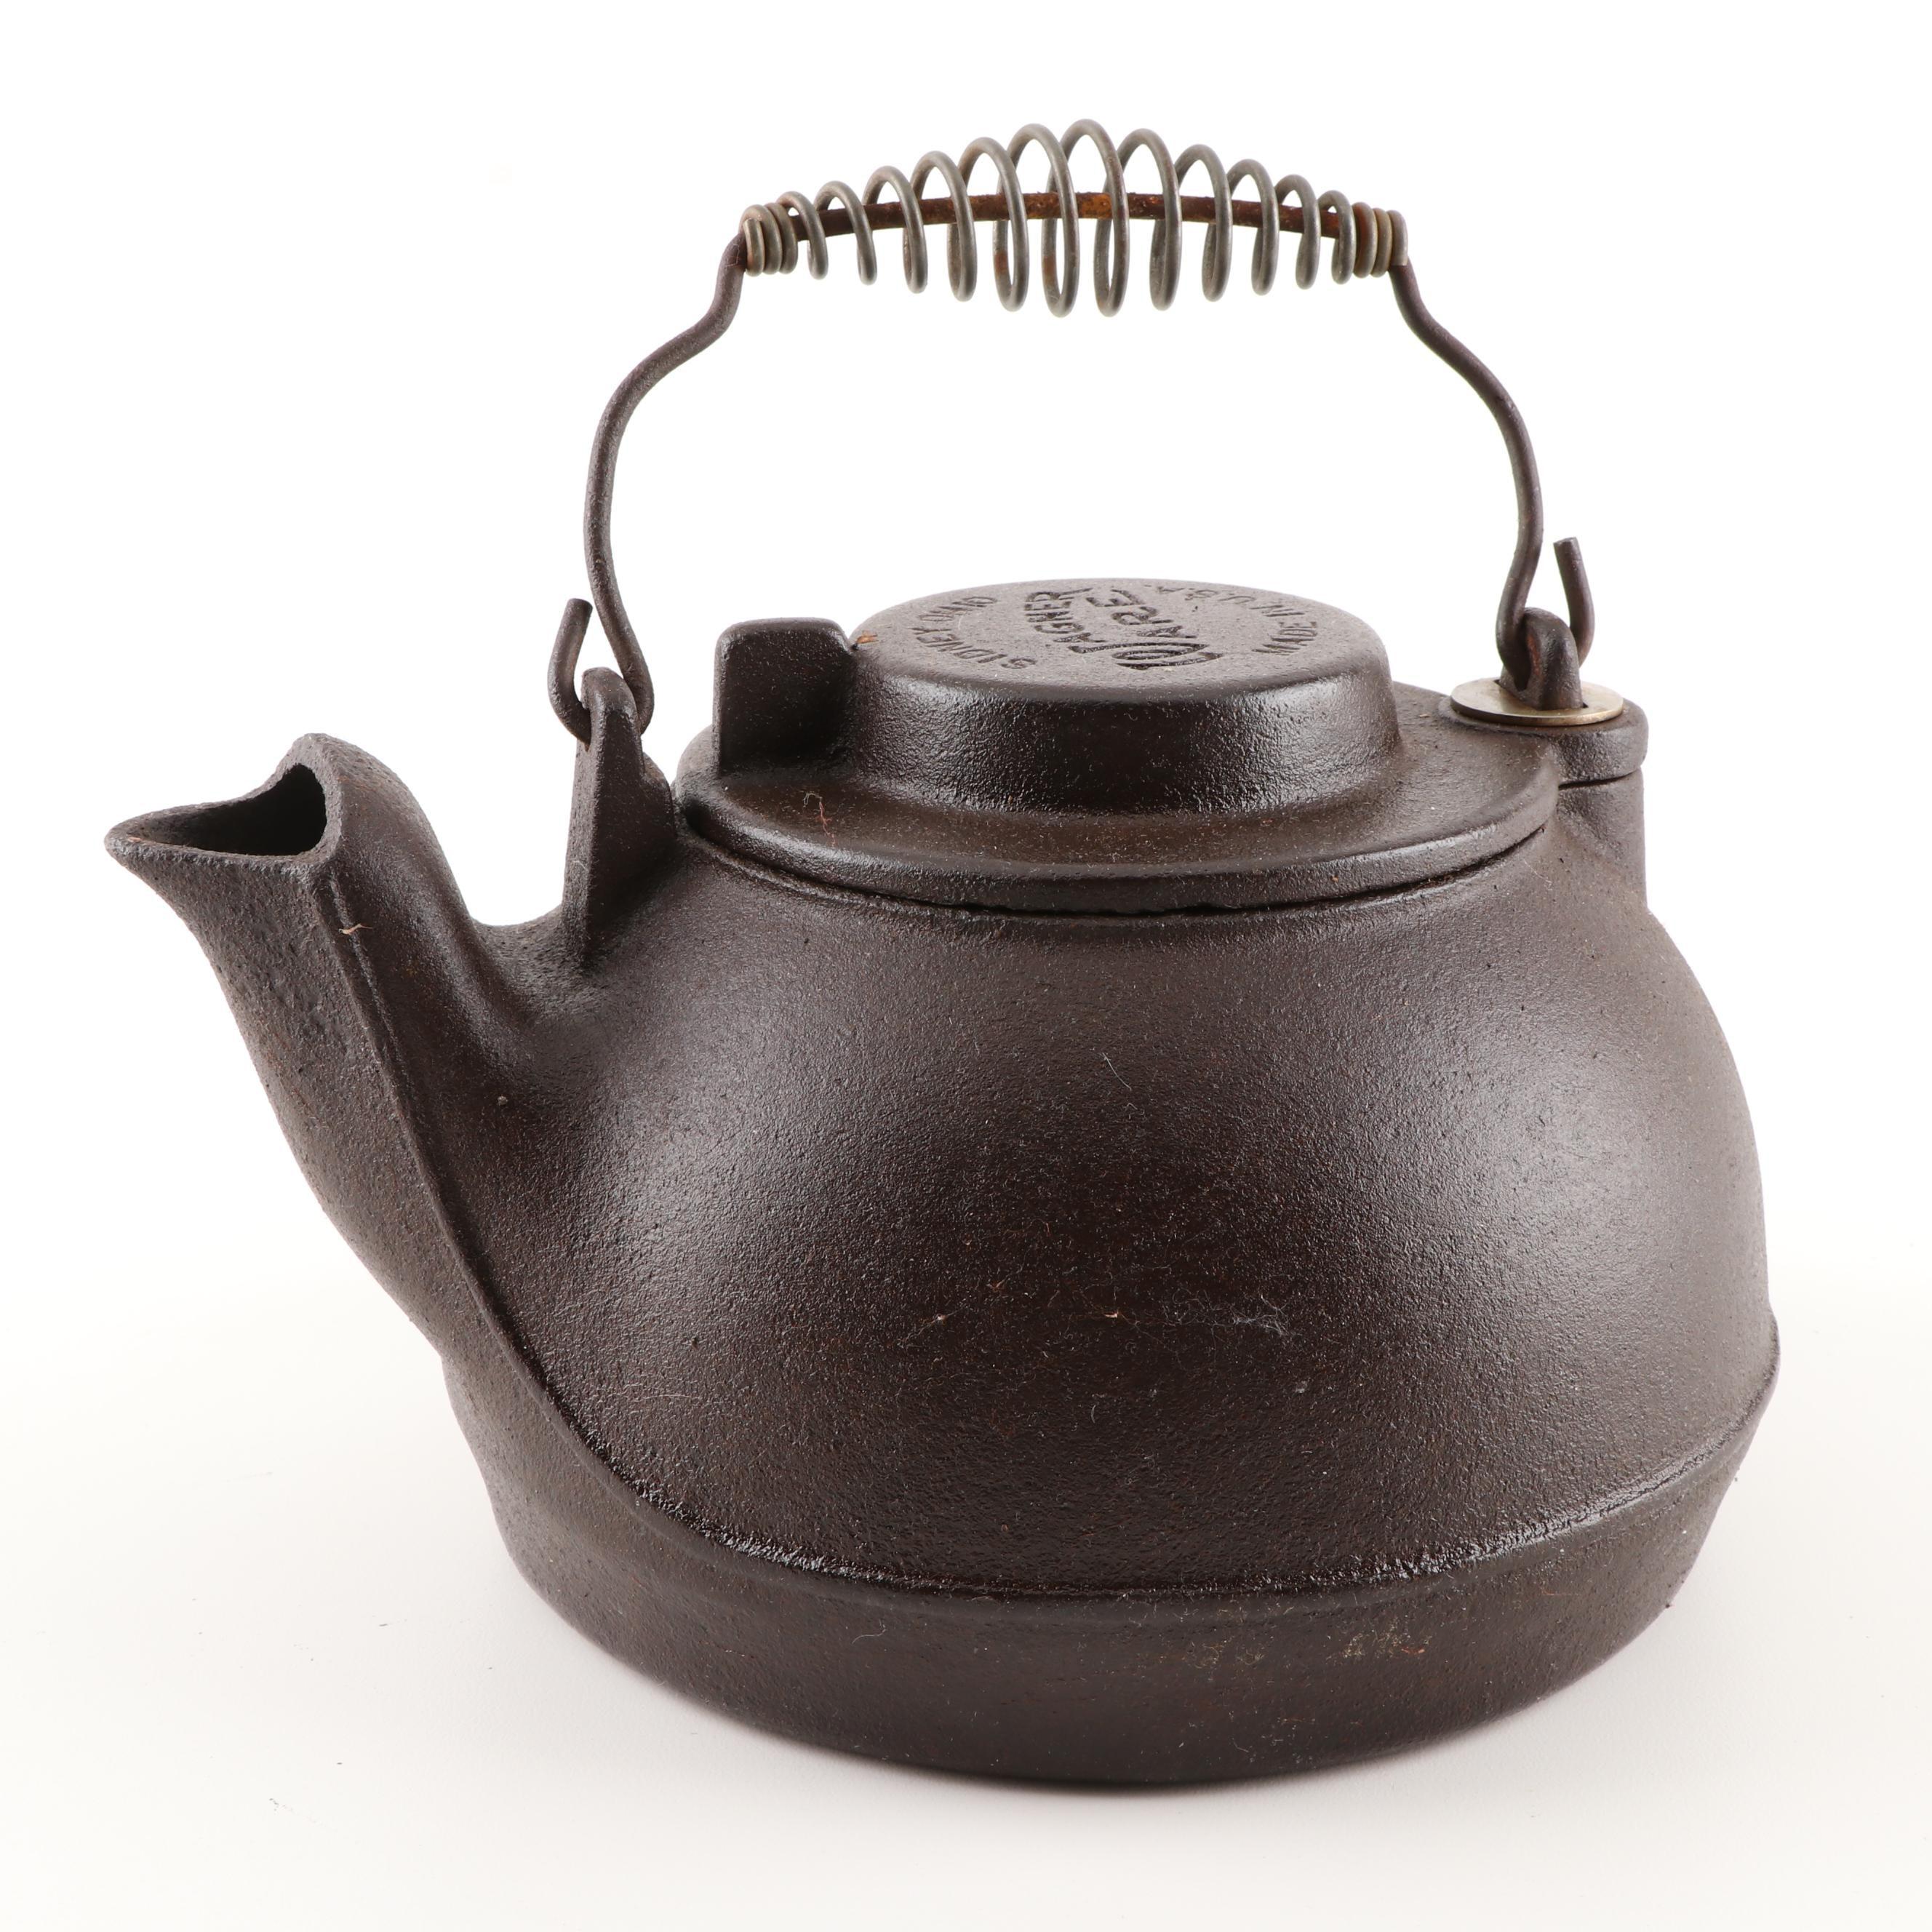 Wagner Ware Cast Iron Tea Kettle